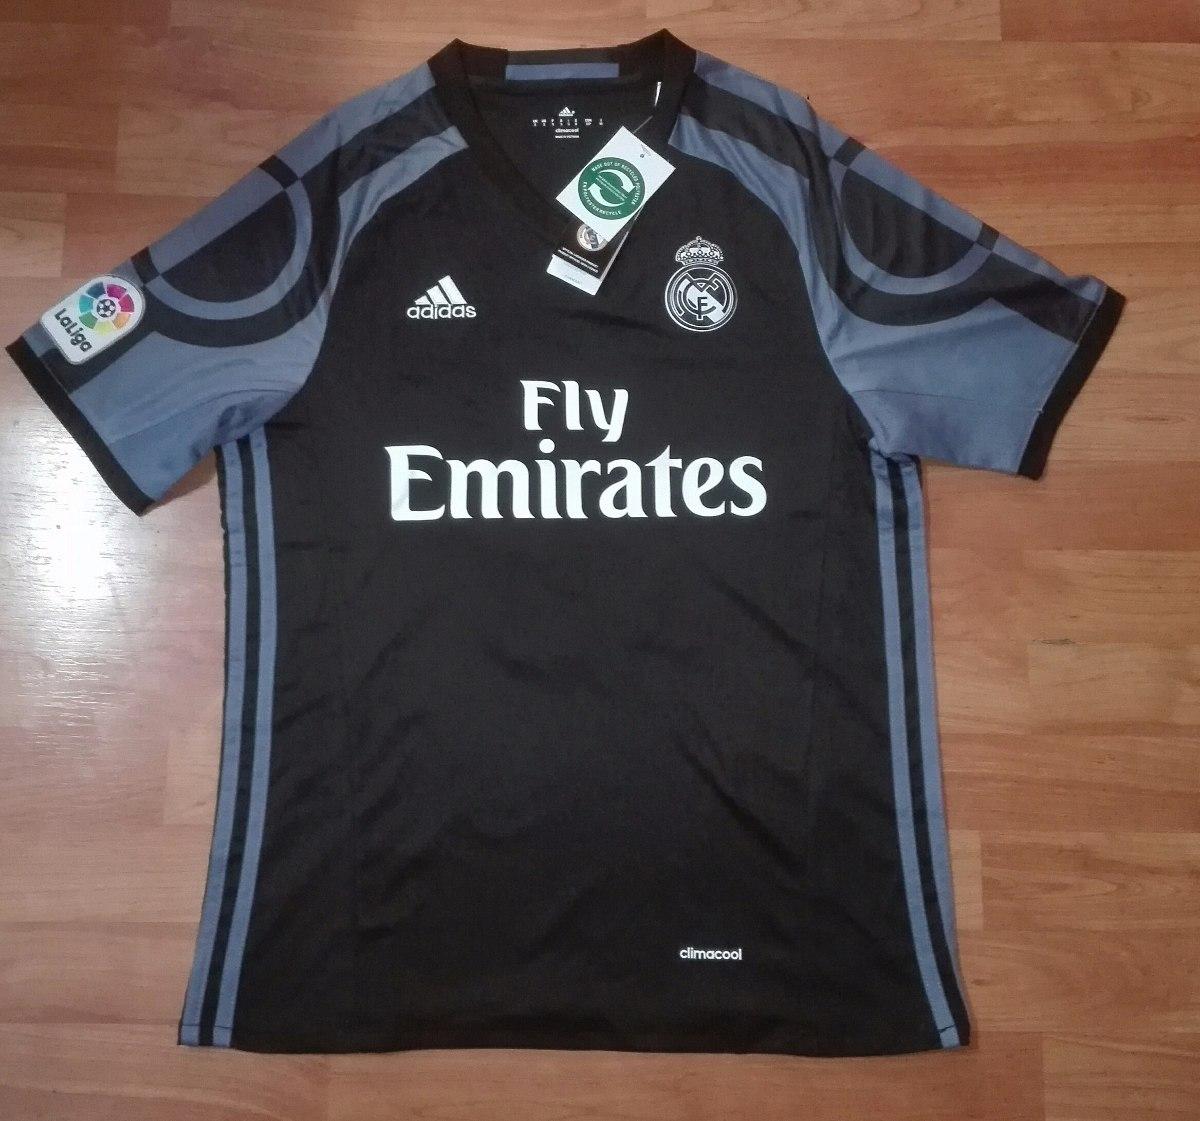 Camiseta Real Madrid Bale